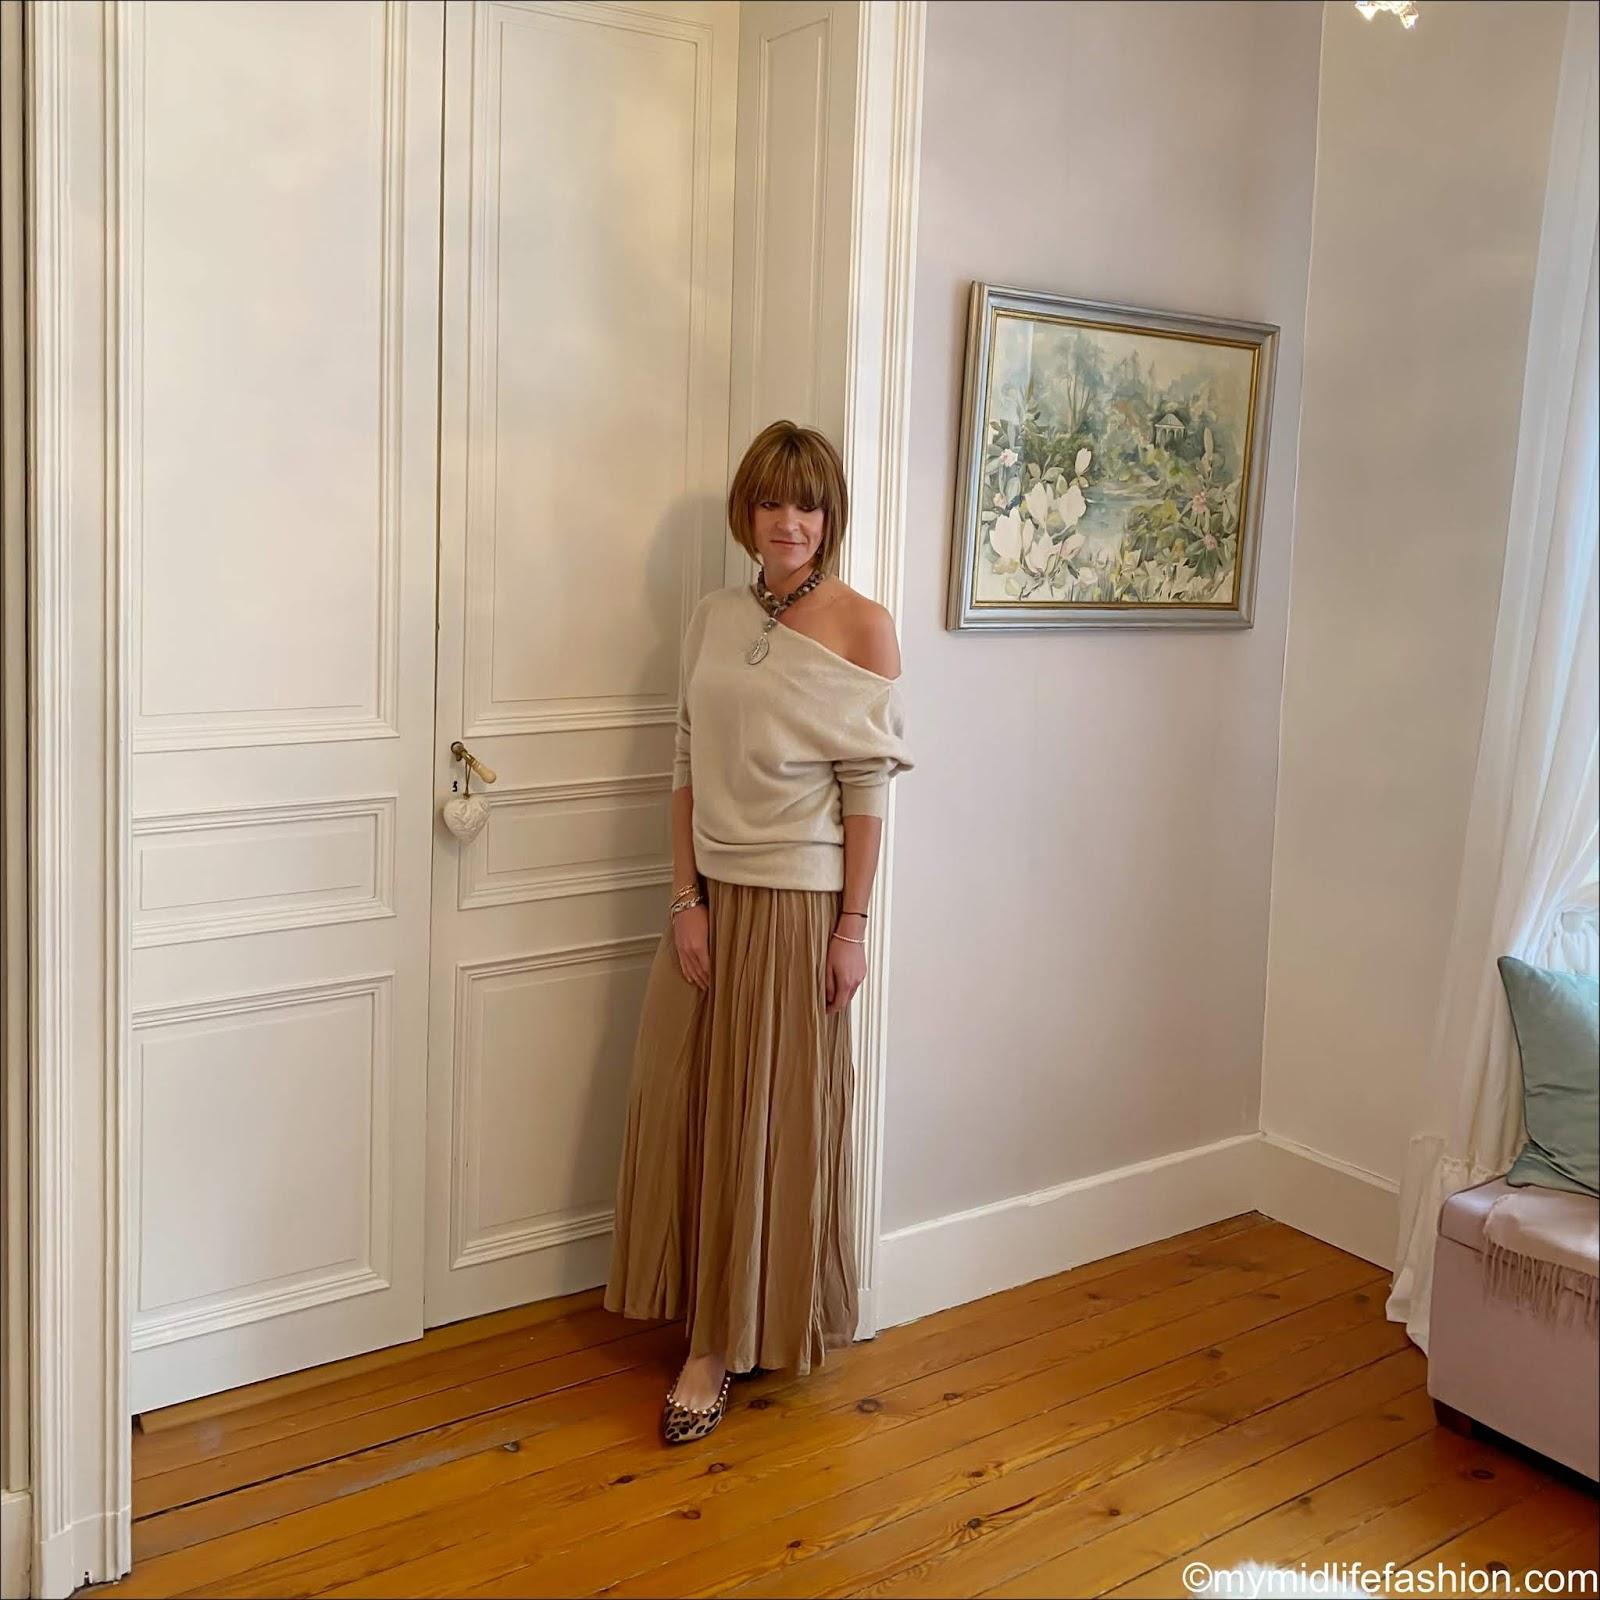 my midlife fashion, h and m lyocell skirt, zara off the shoulder cashmere jumper, leopard print flat ballet pumps